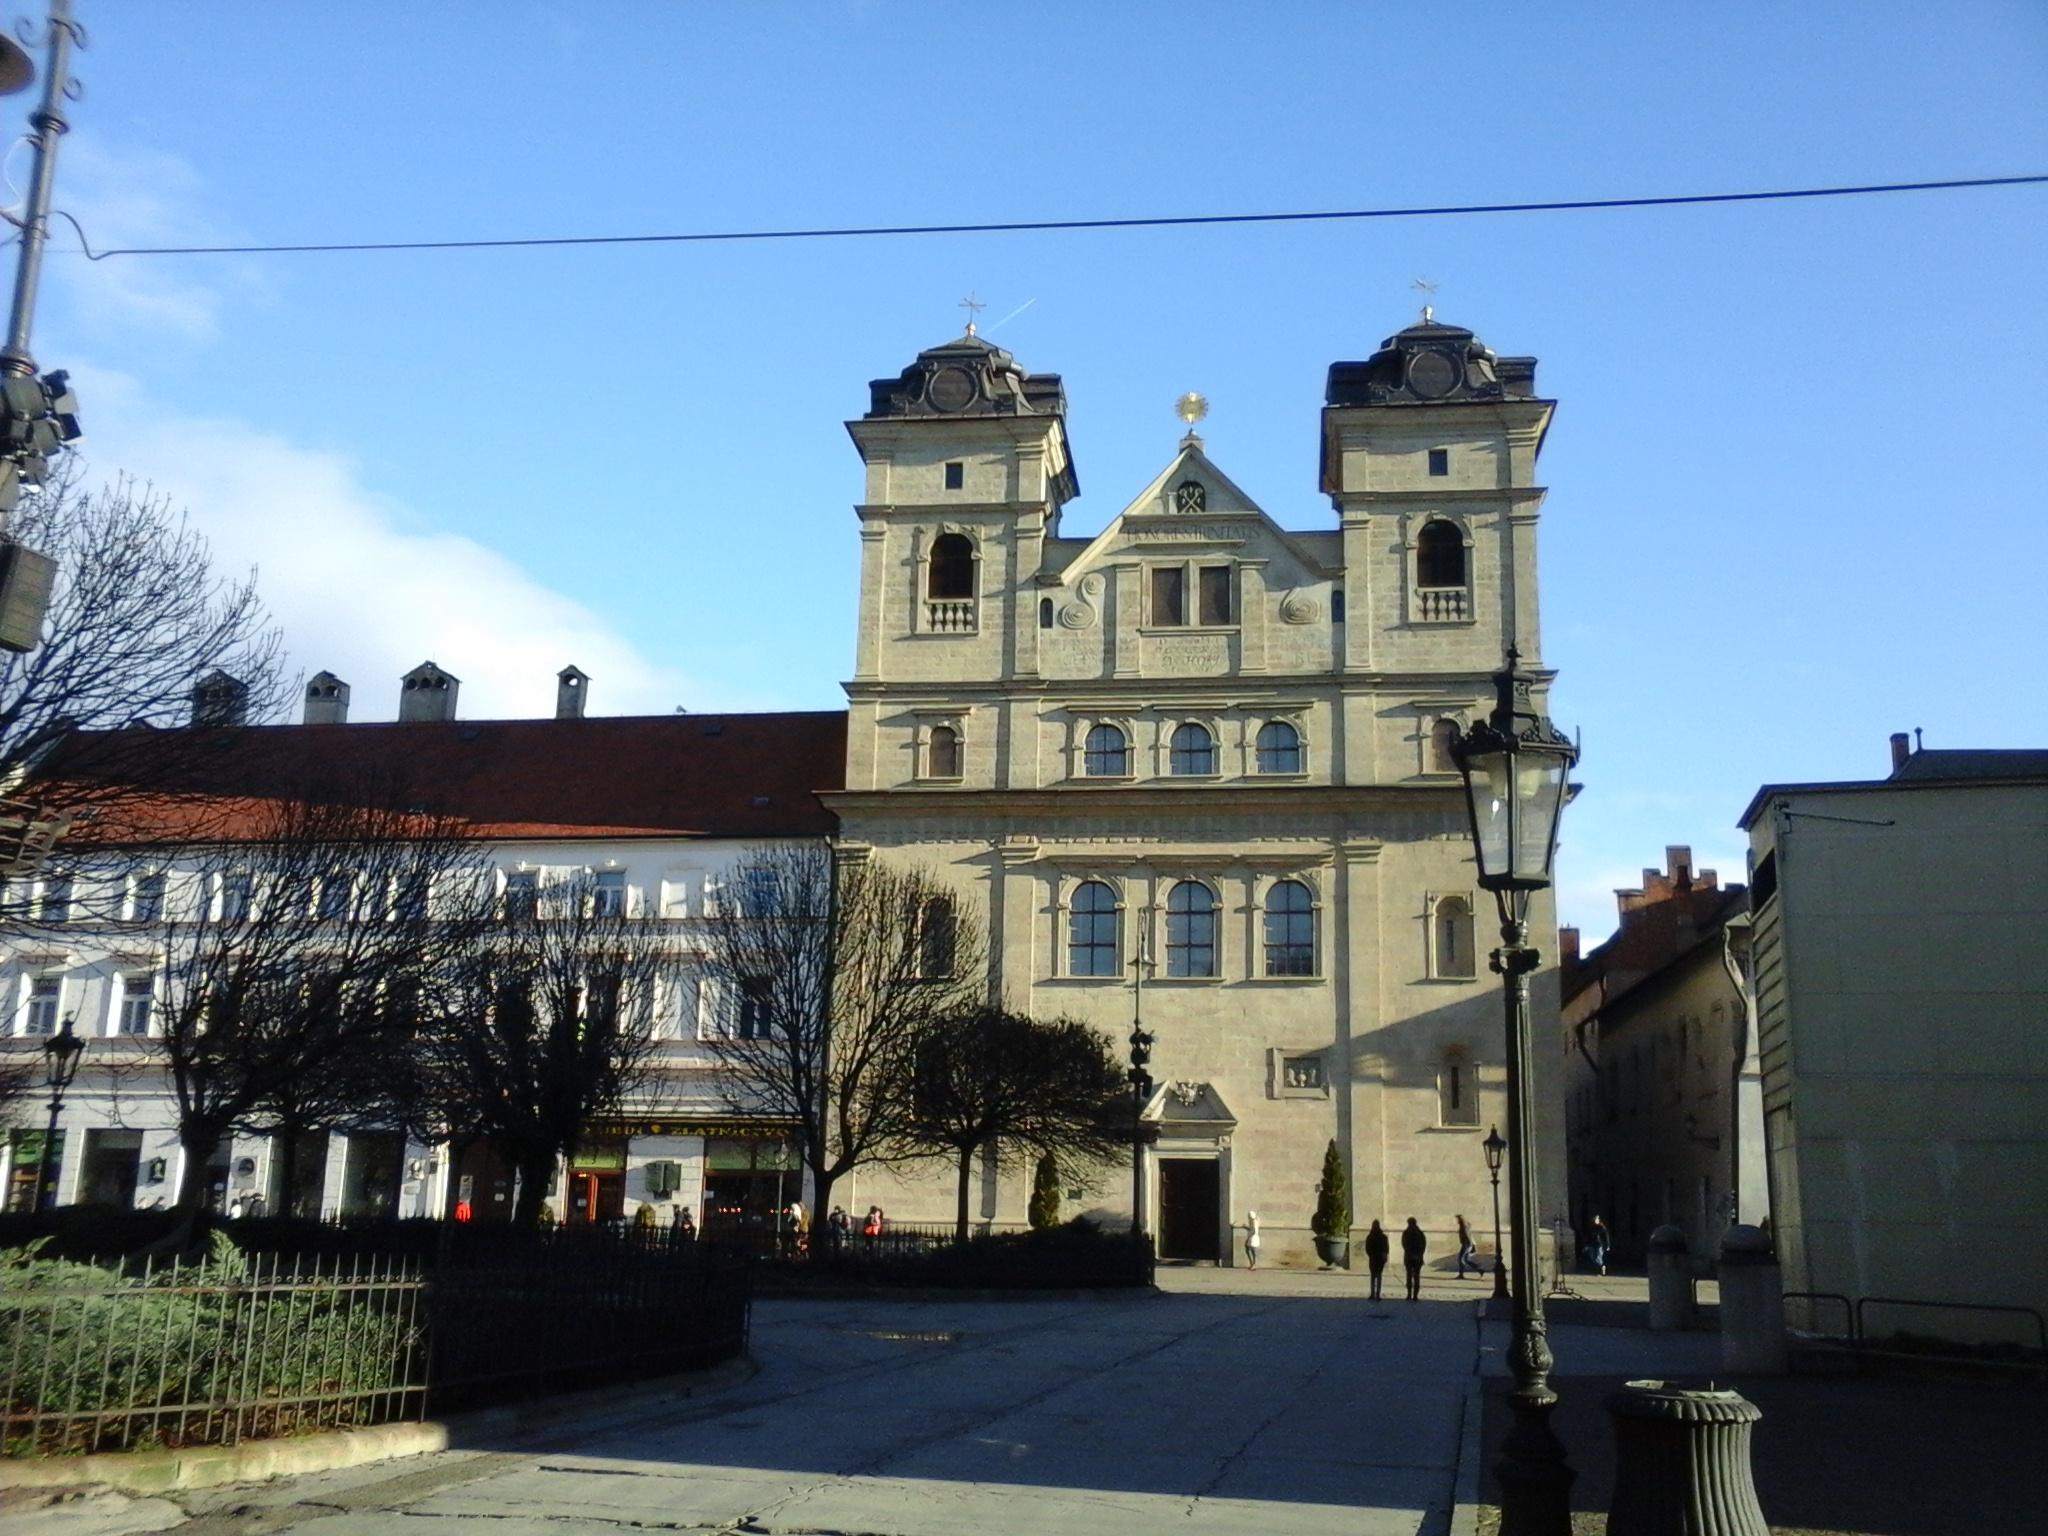 Jezsuita-premontrei templom